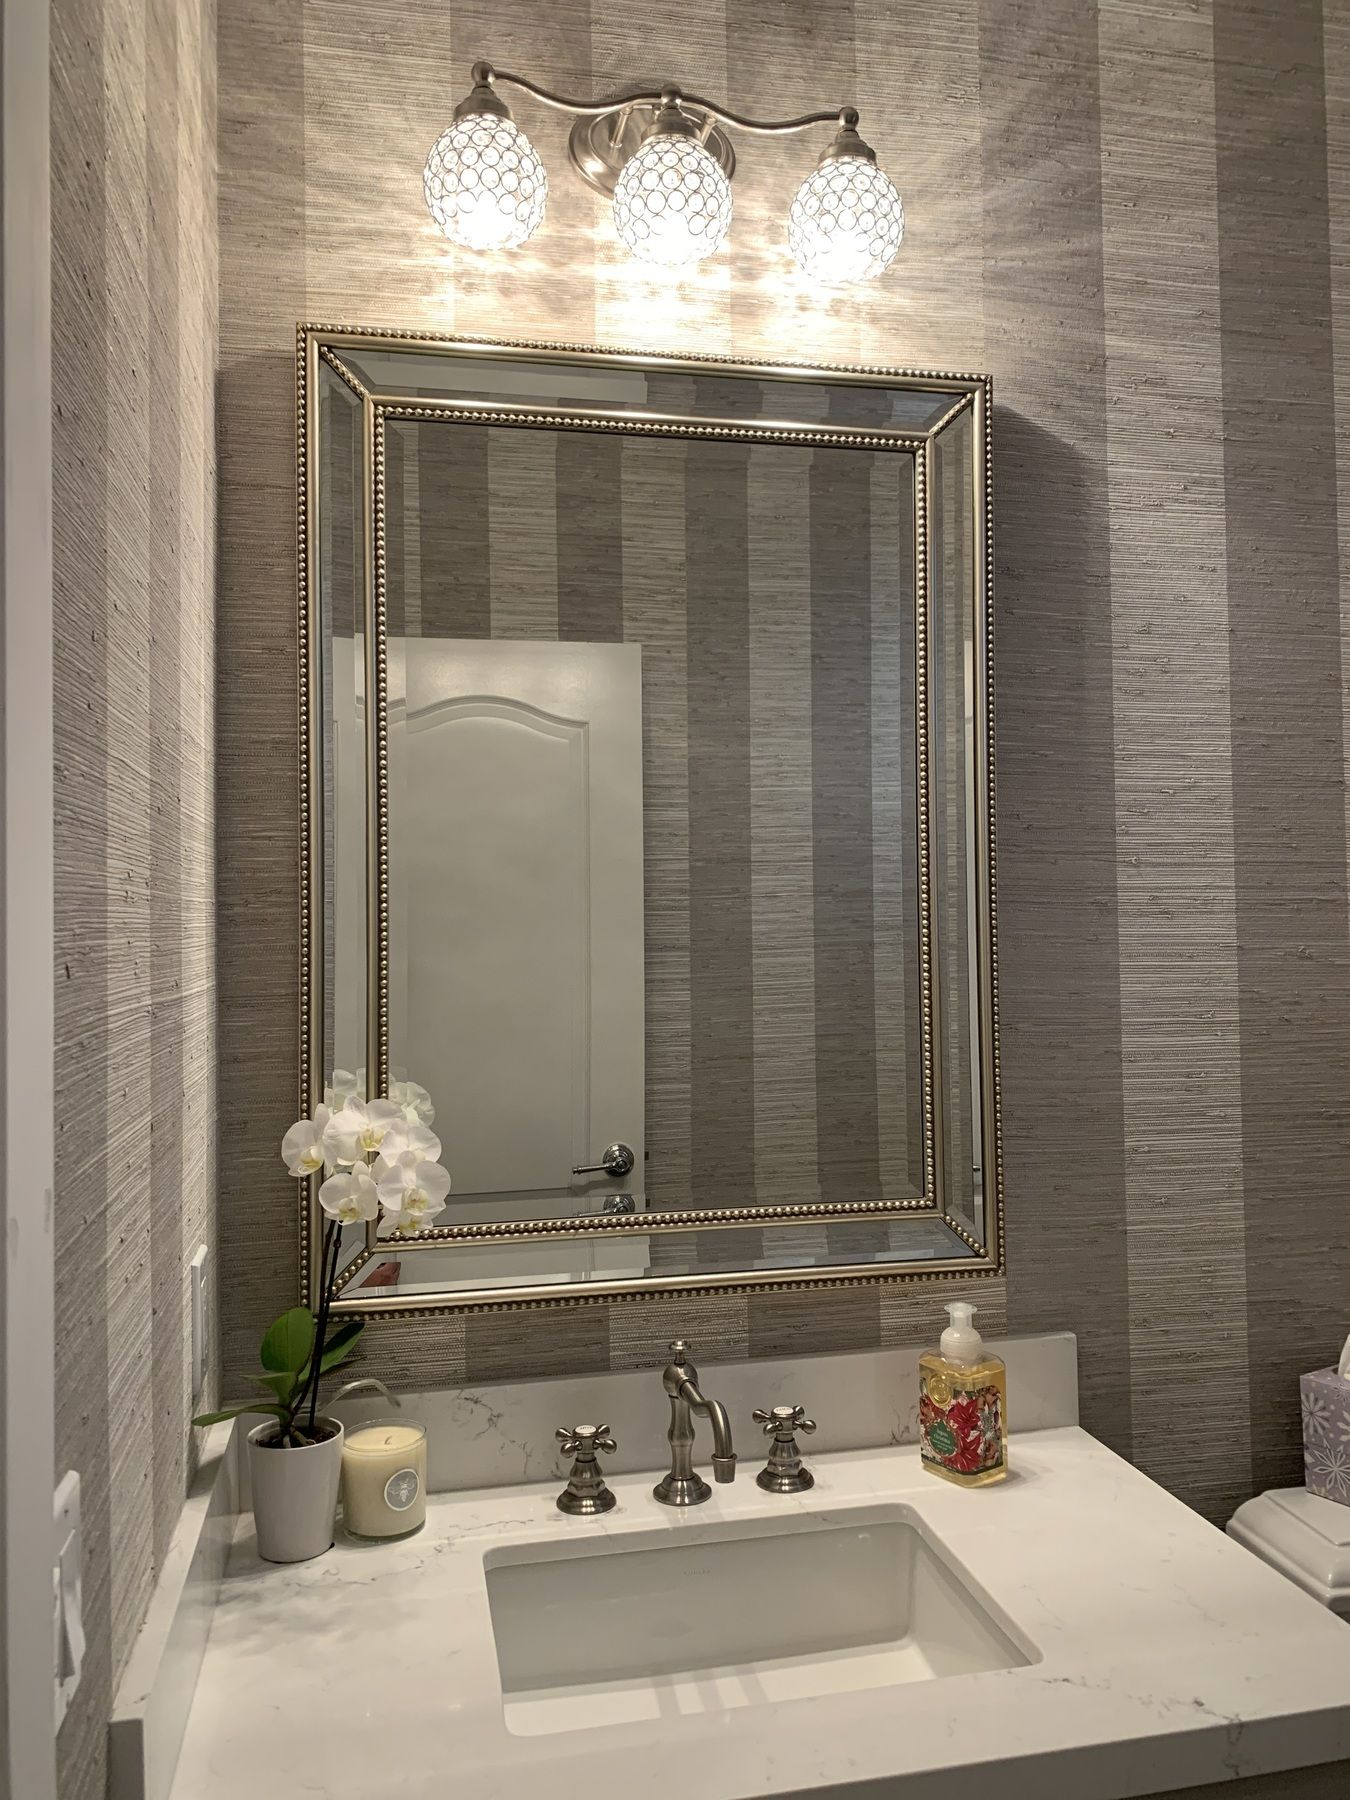 Uttermost Palais Silver 30 X 40 Beaded Wall Mirror 6d394 Lamps Plus In 2020 Large Bathroom Mirrors Mirror Wall Bathroom Mirror Design